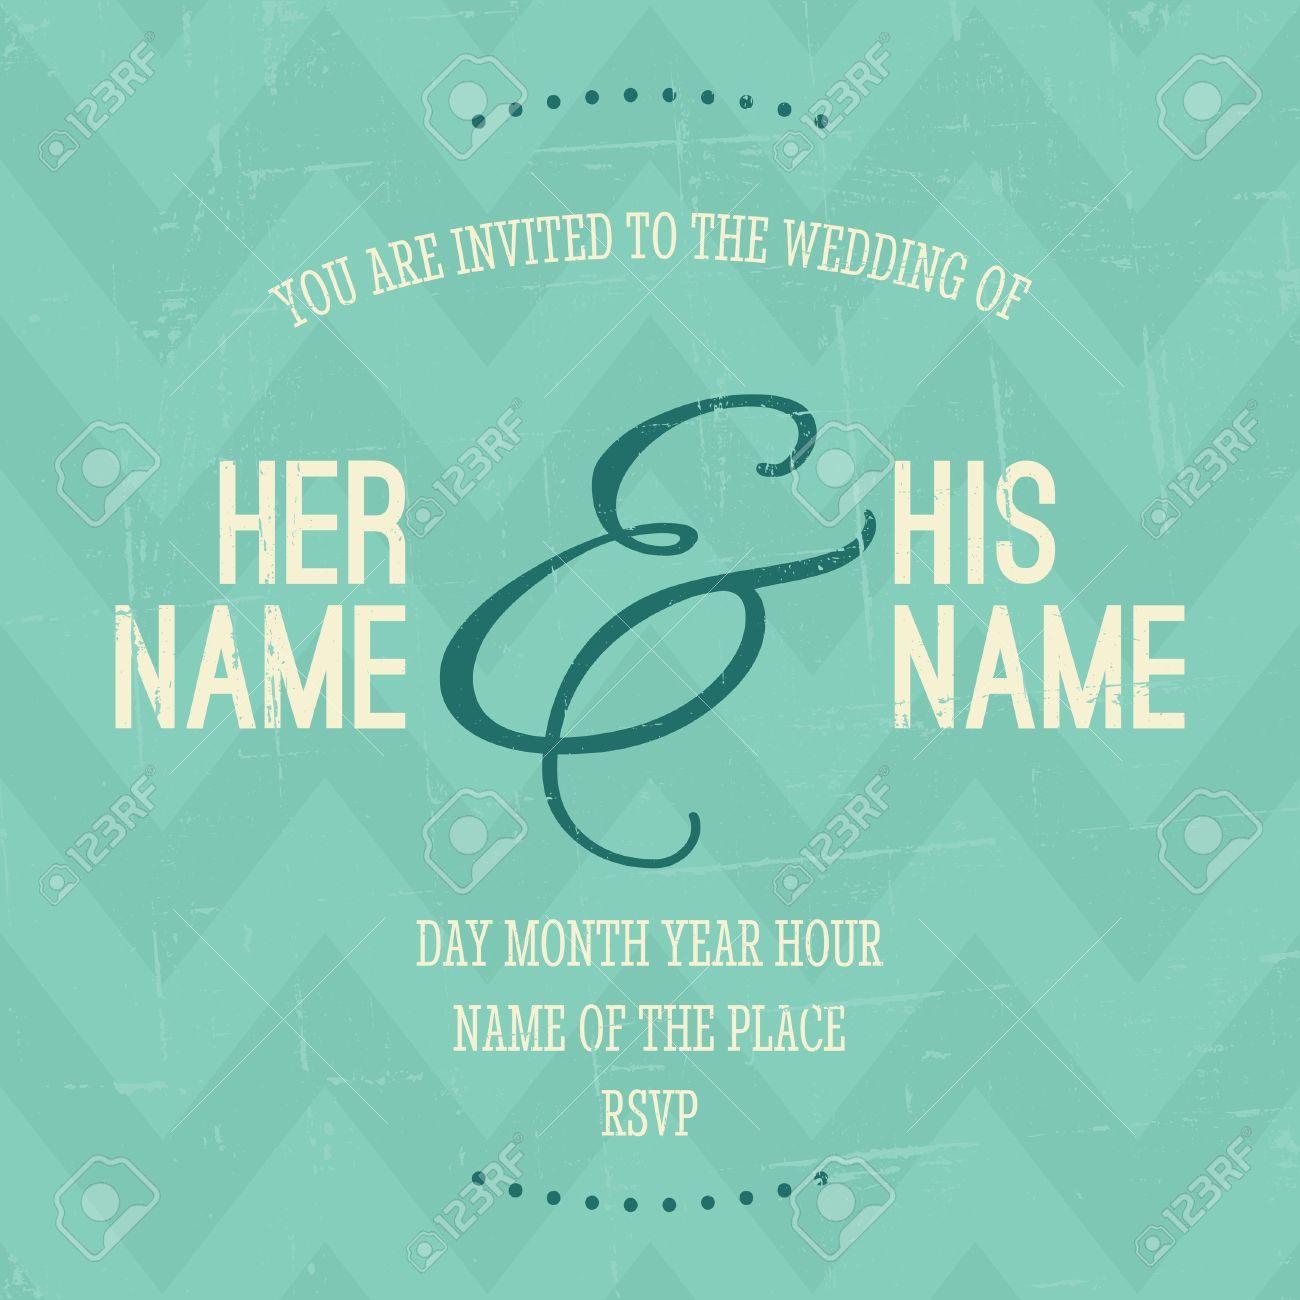 Invitation de mariage Styles